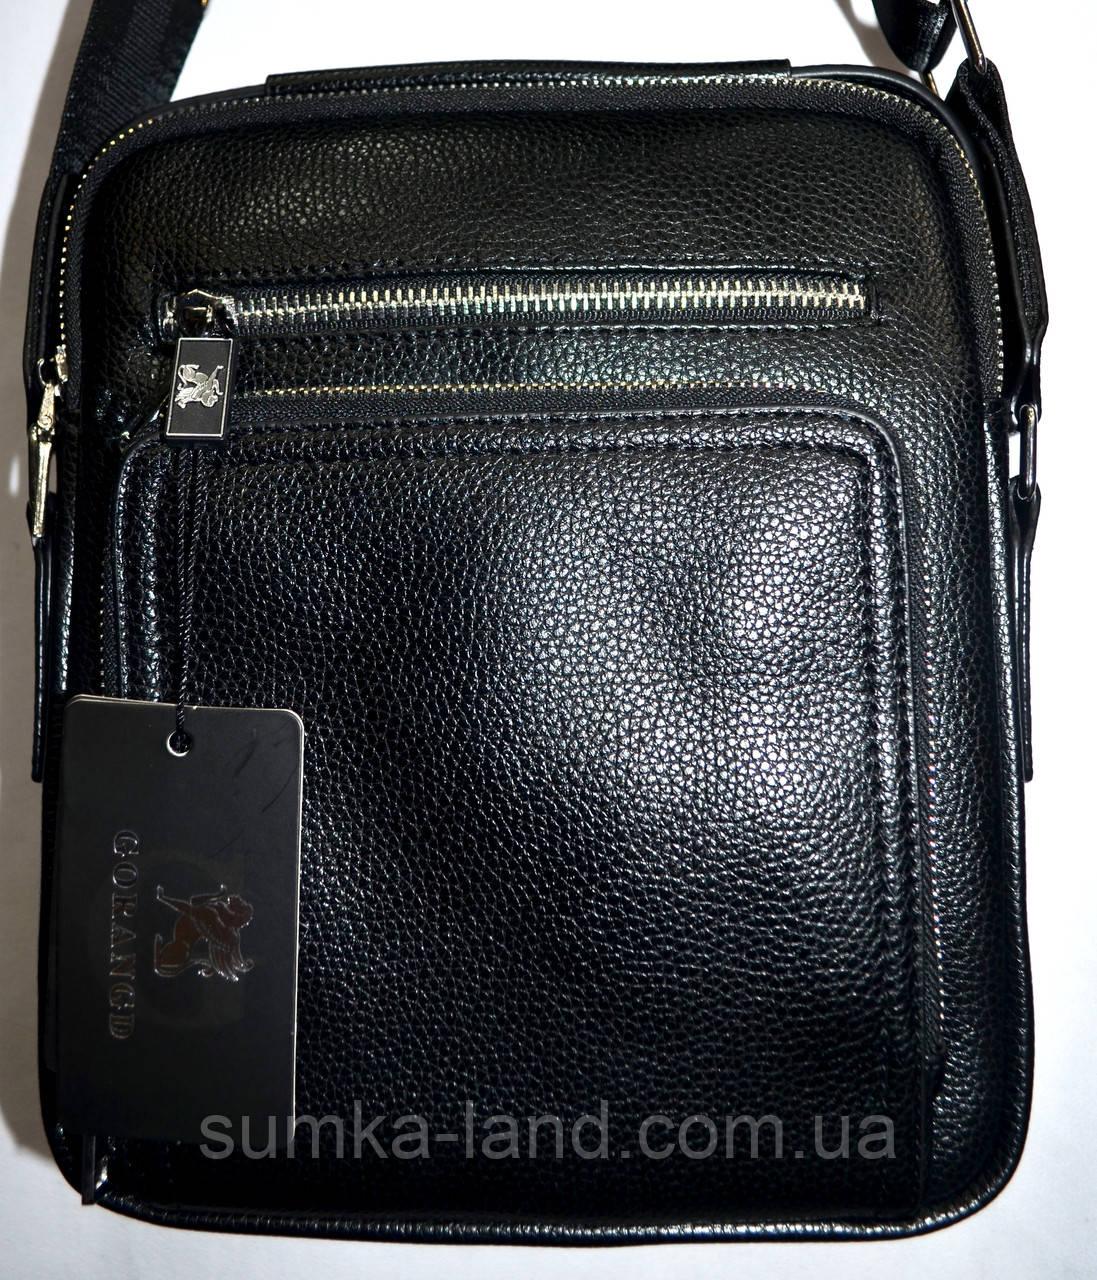 abfc3dc5a4fe Мужская черная кожаная барсетка на плечо 21*25: продажа, цена в ...